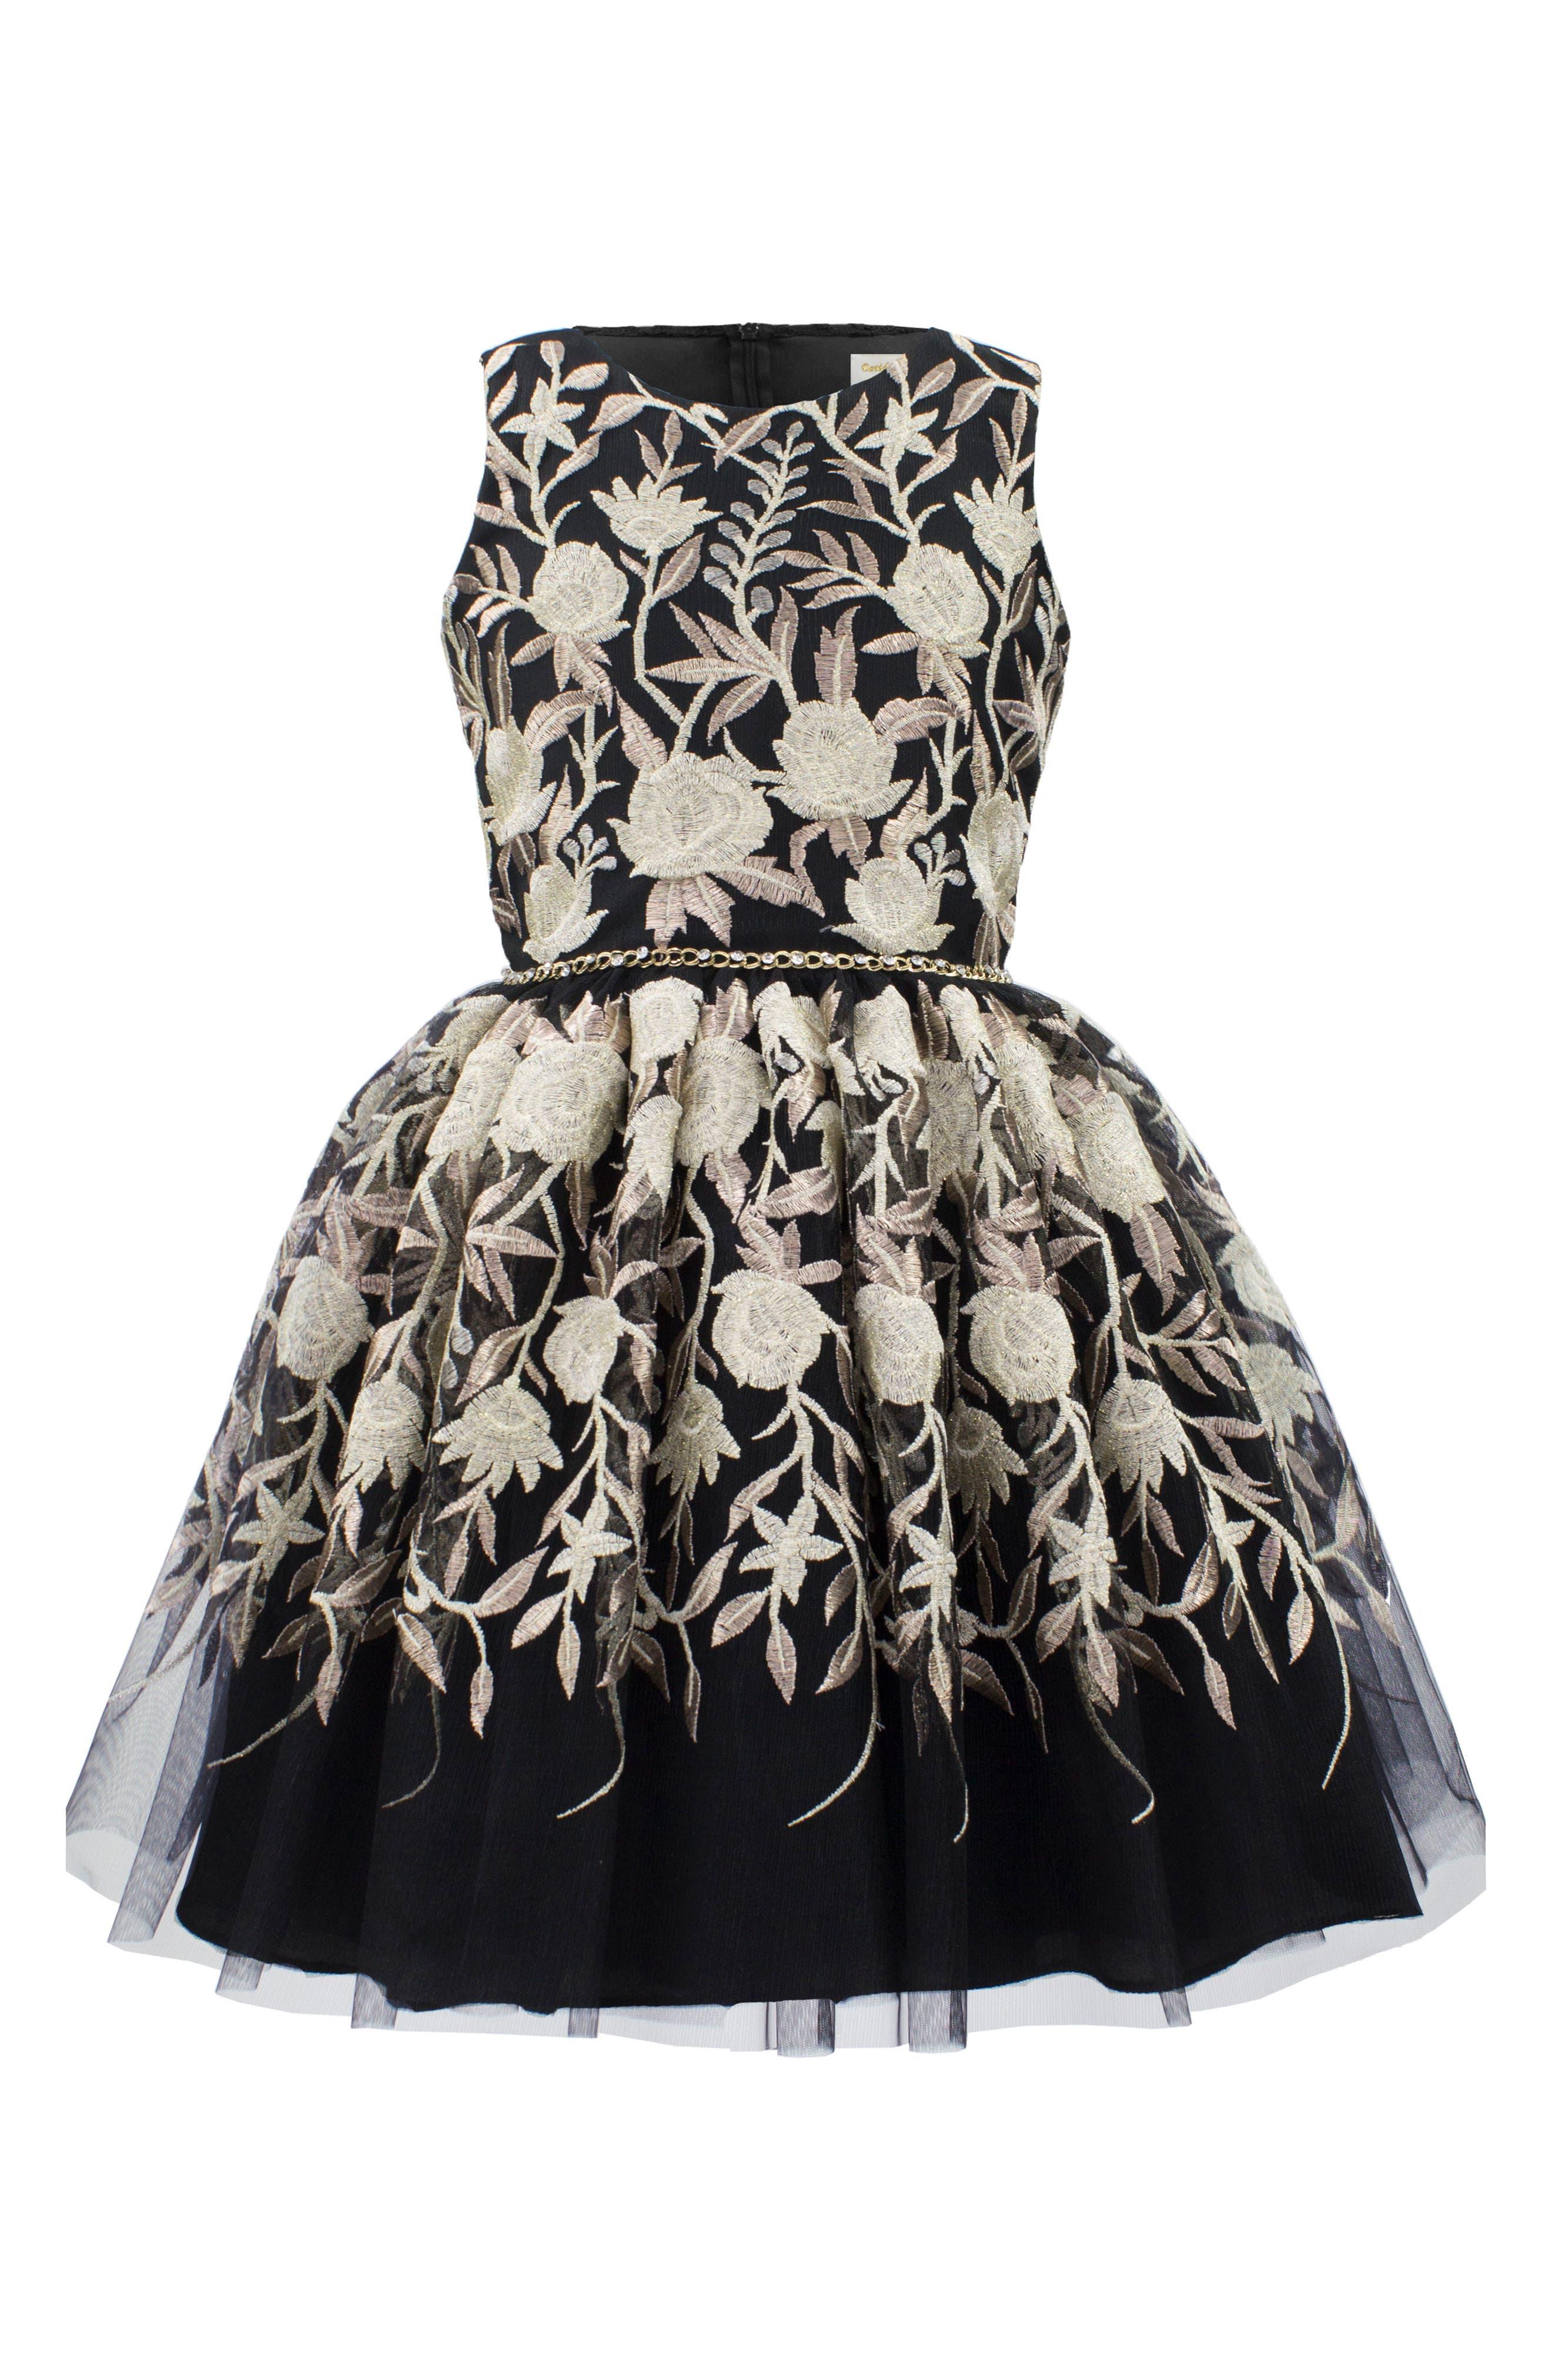 Main Image - David Charles Embroidered Tulle Dress (Big Girls)